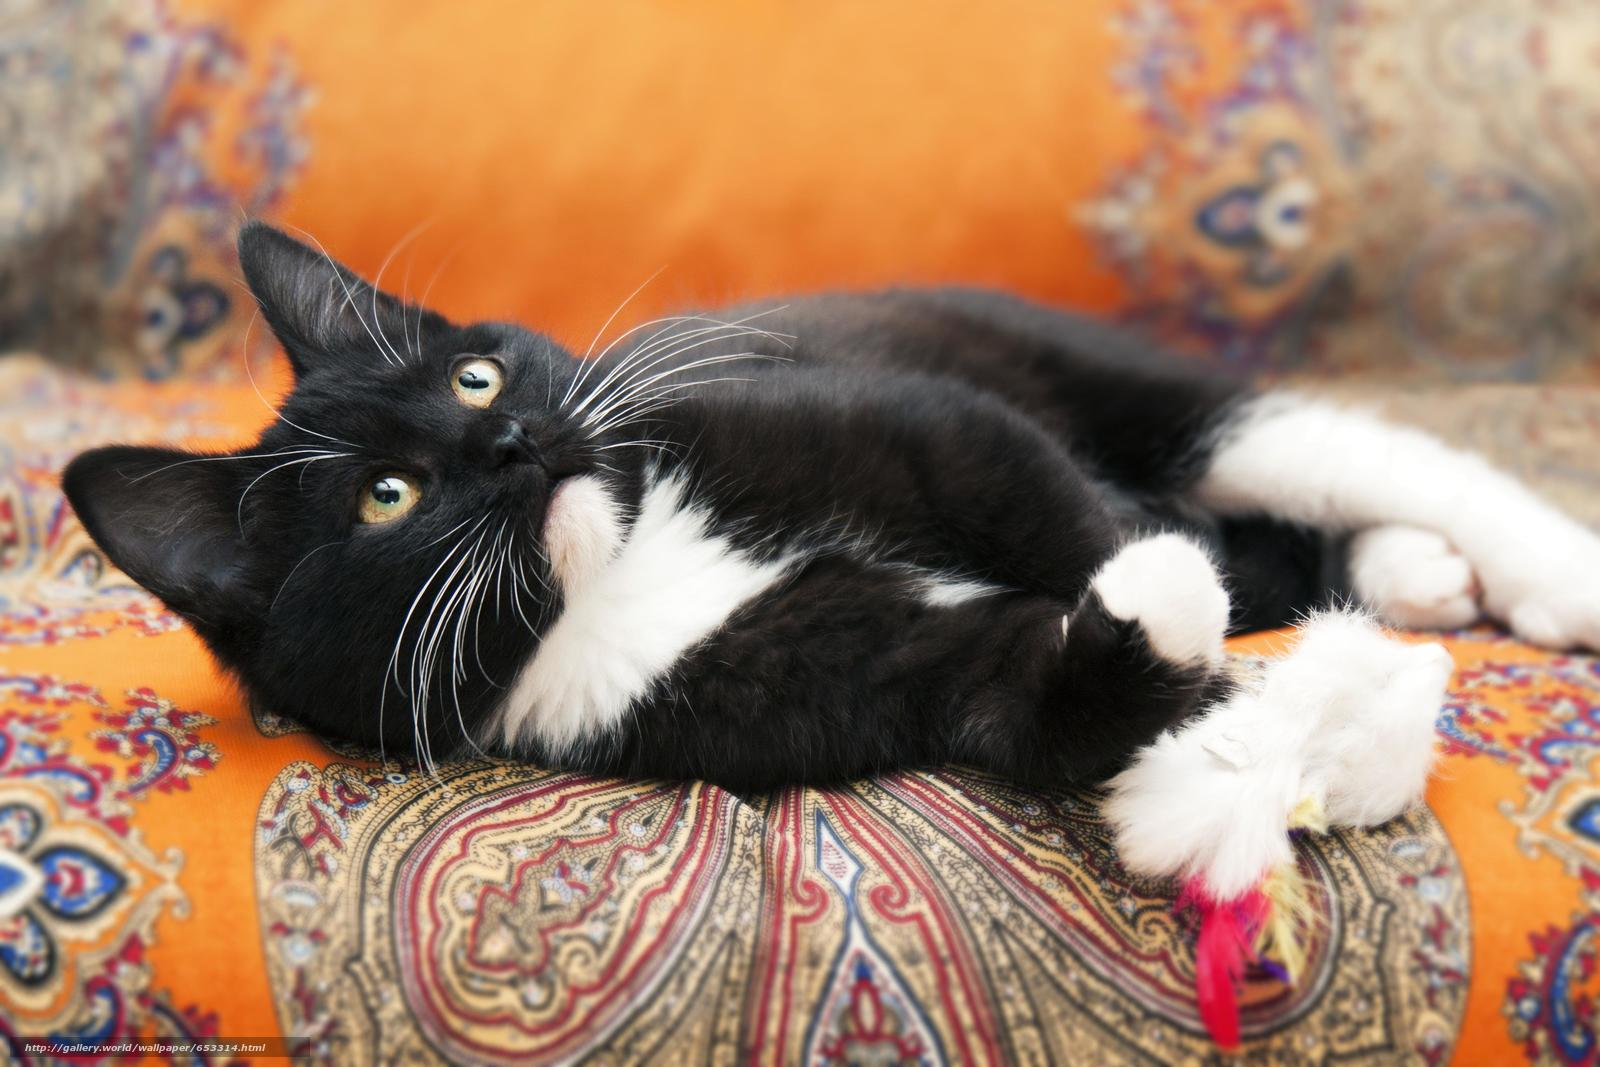 Download wallpaper COTE,  kitten,  black-white,  cat free desktop wallpaper in the resolution 4122x2748 — picture №653314